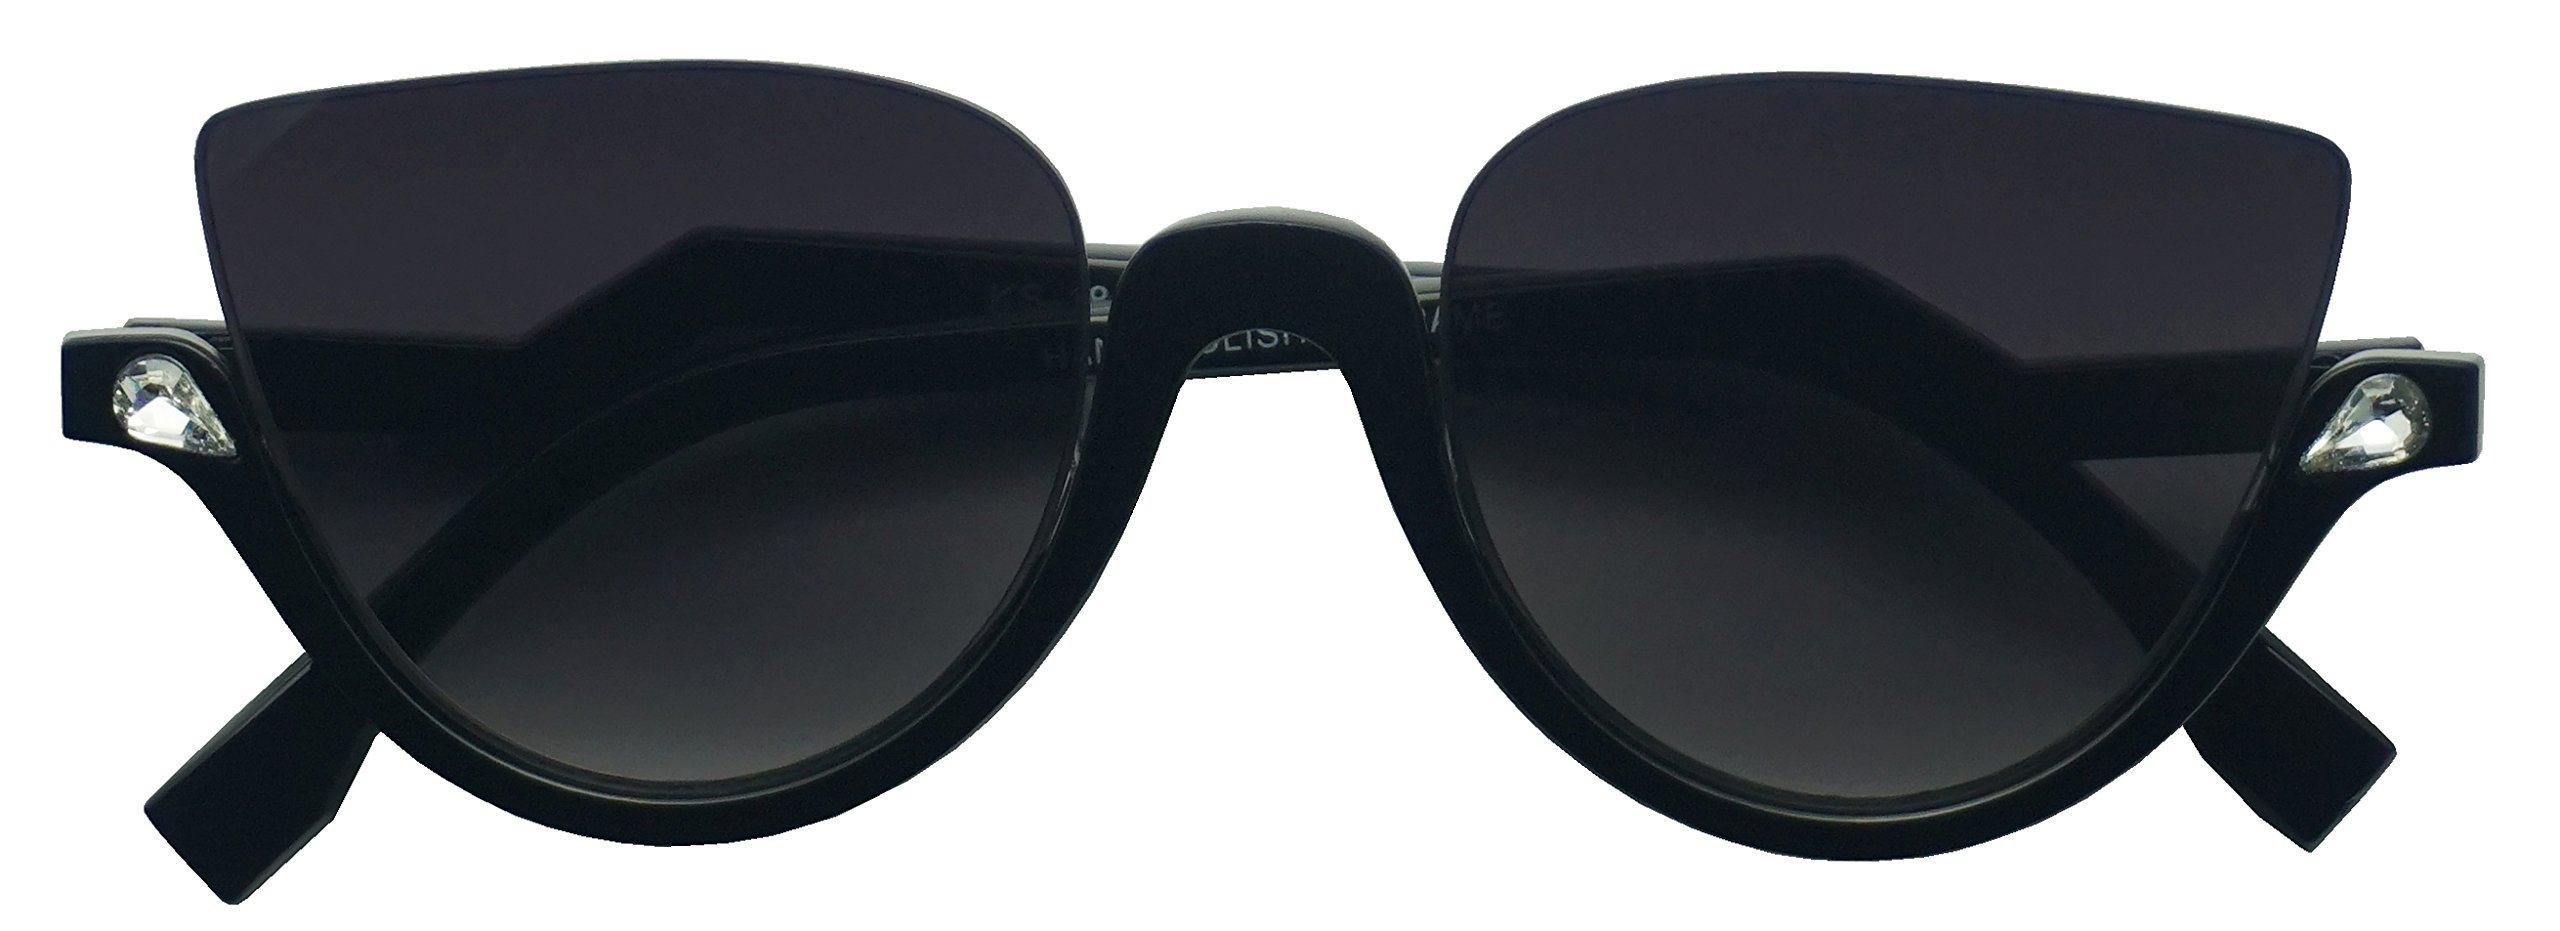 Vintage Half Frame Rhinestone Studded MOD CatEye Clear Sun Glasses (Black, Black)